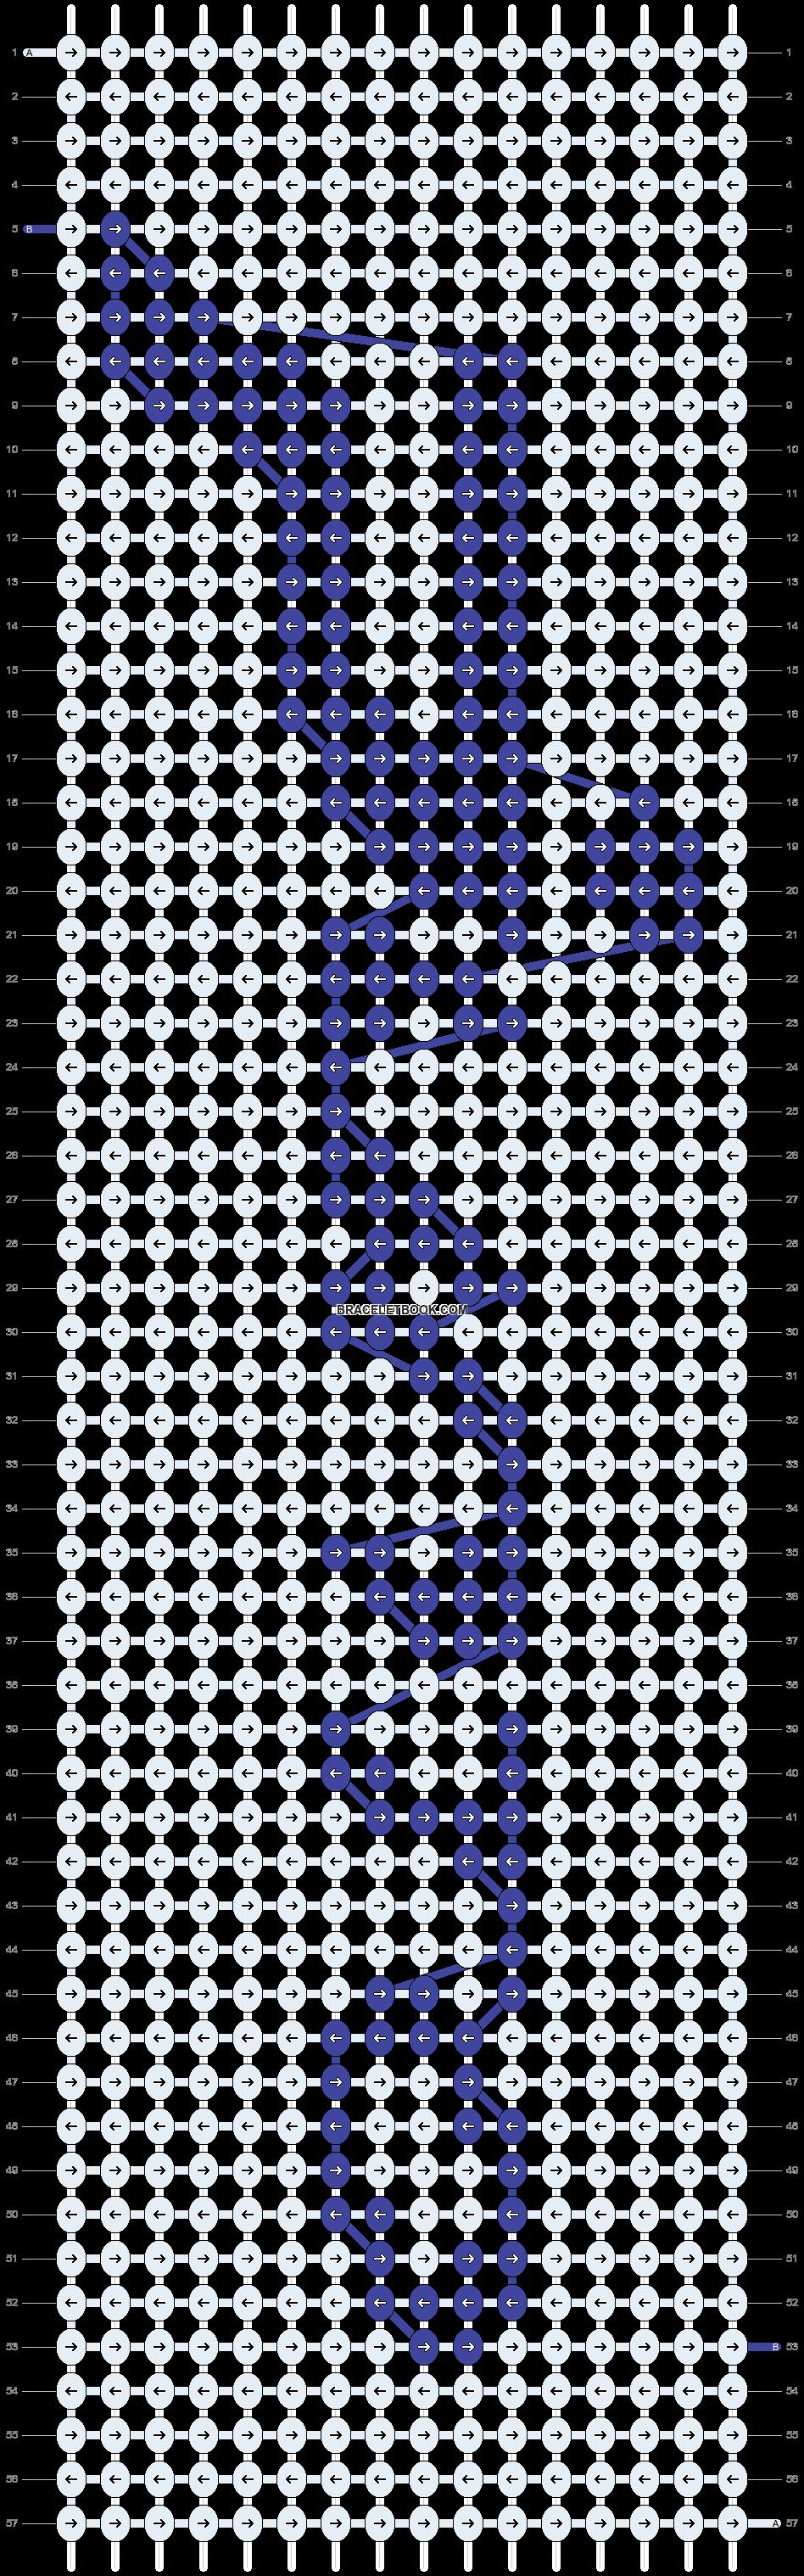 Alpha pattern #20938 pattern